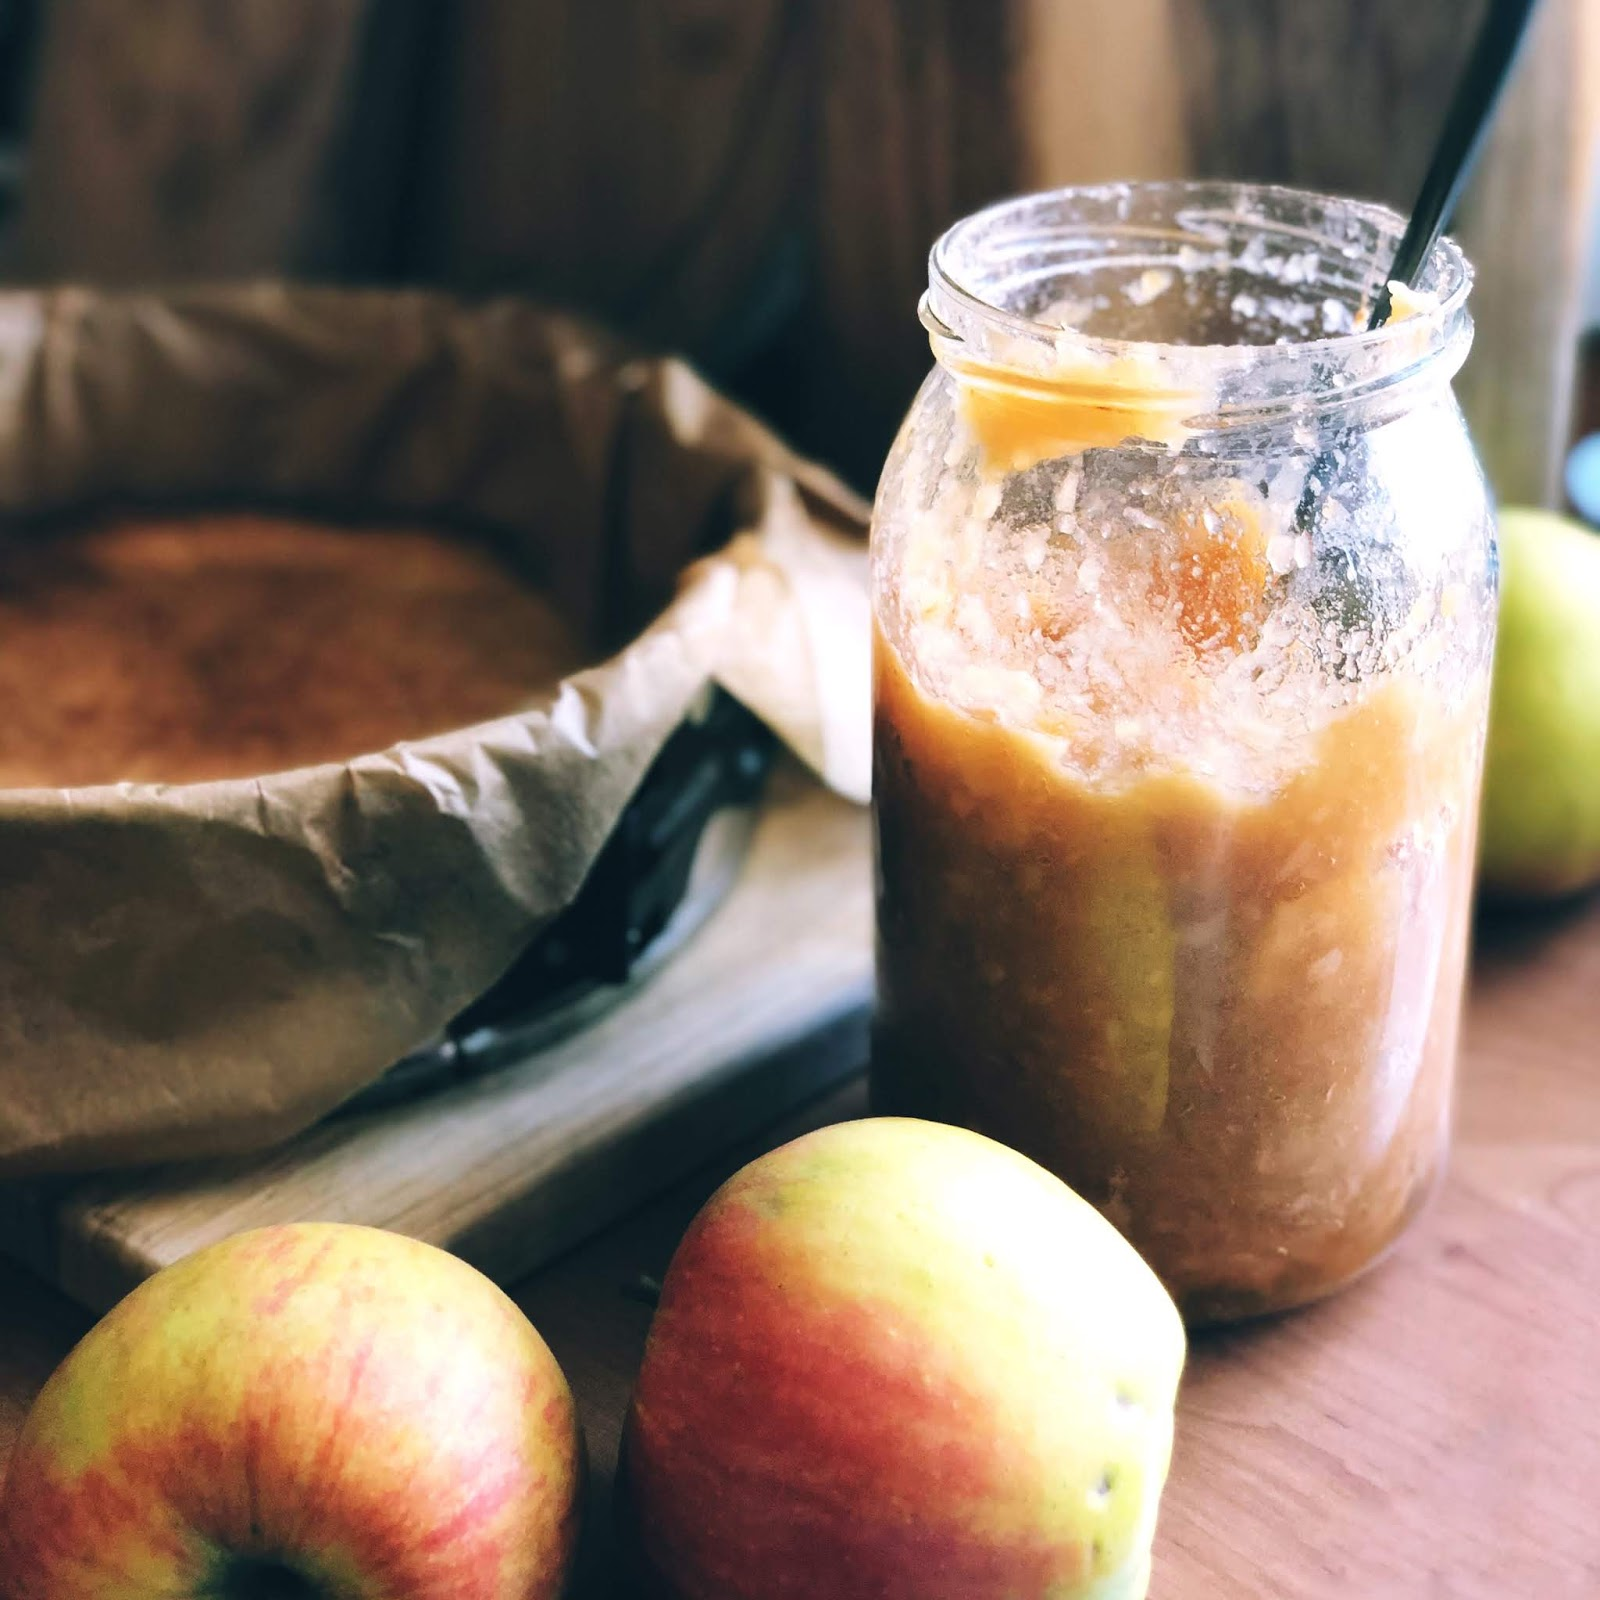 Prażone jabłka do szarlotki i nie tylko